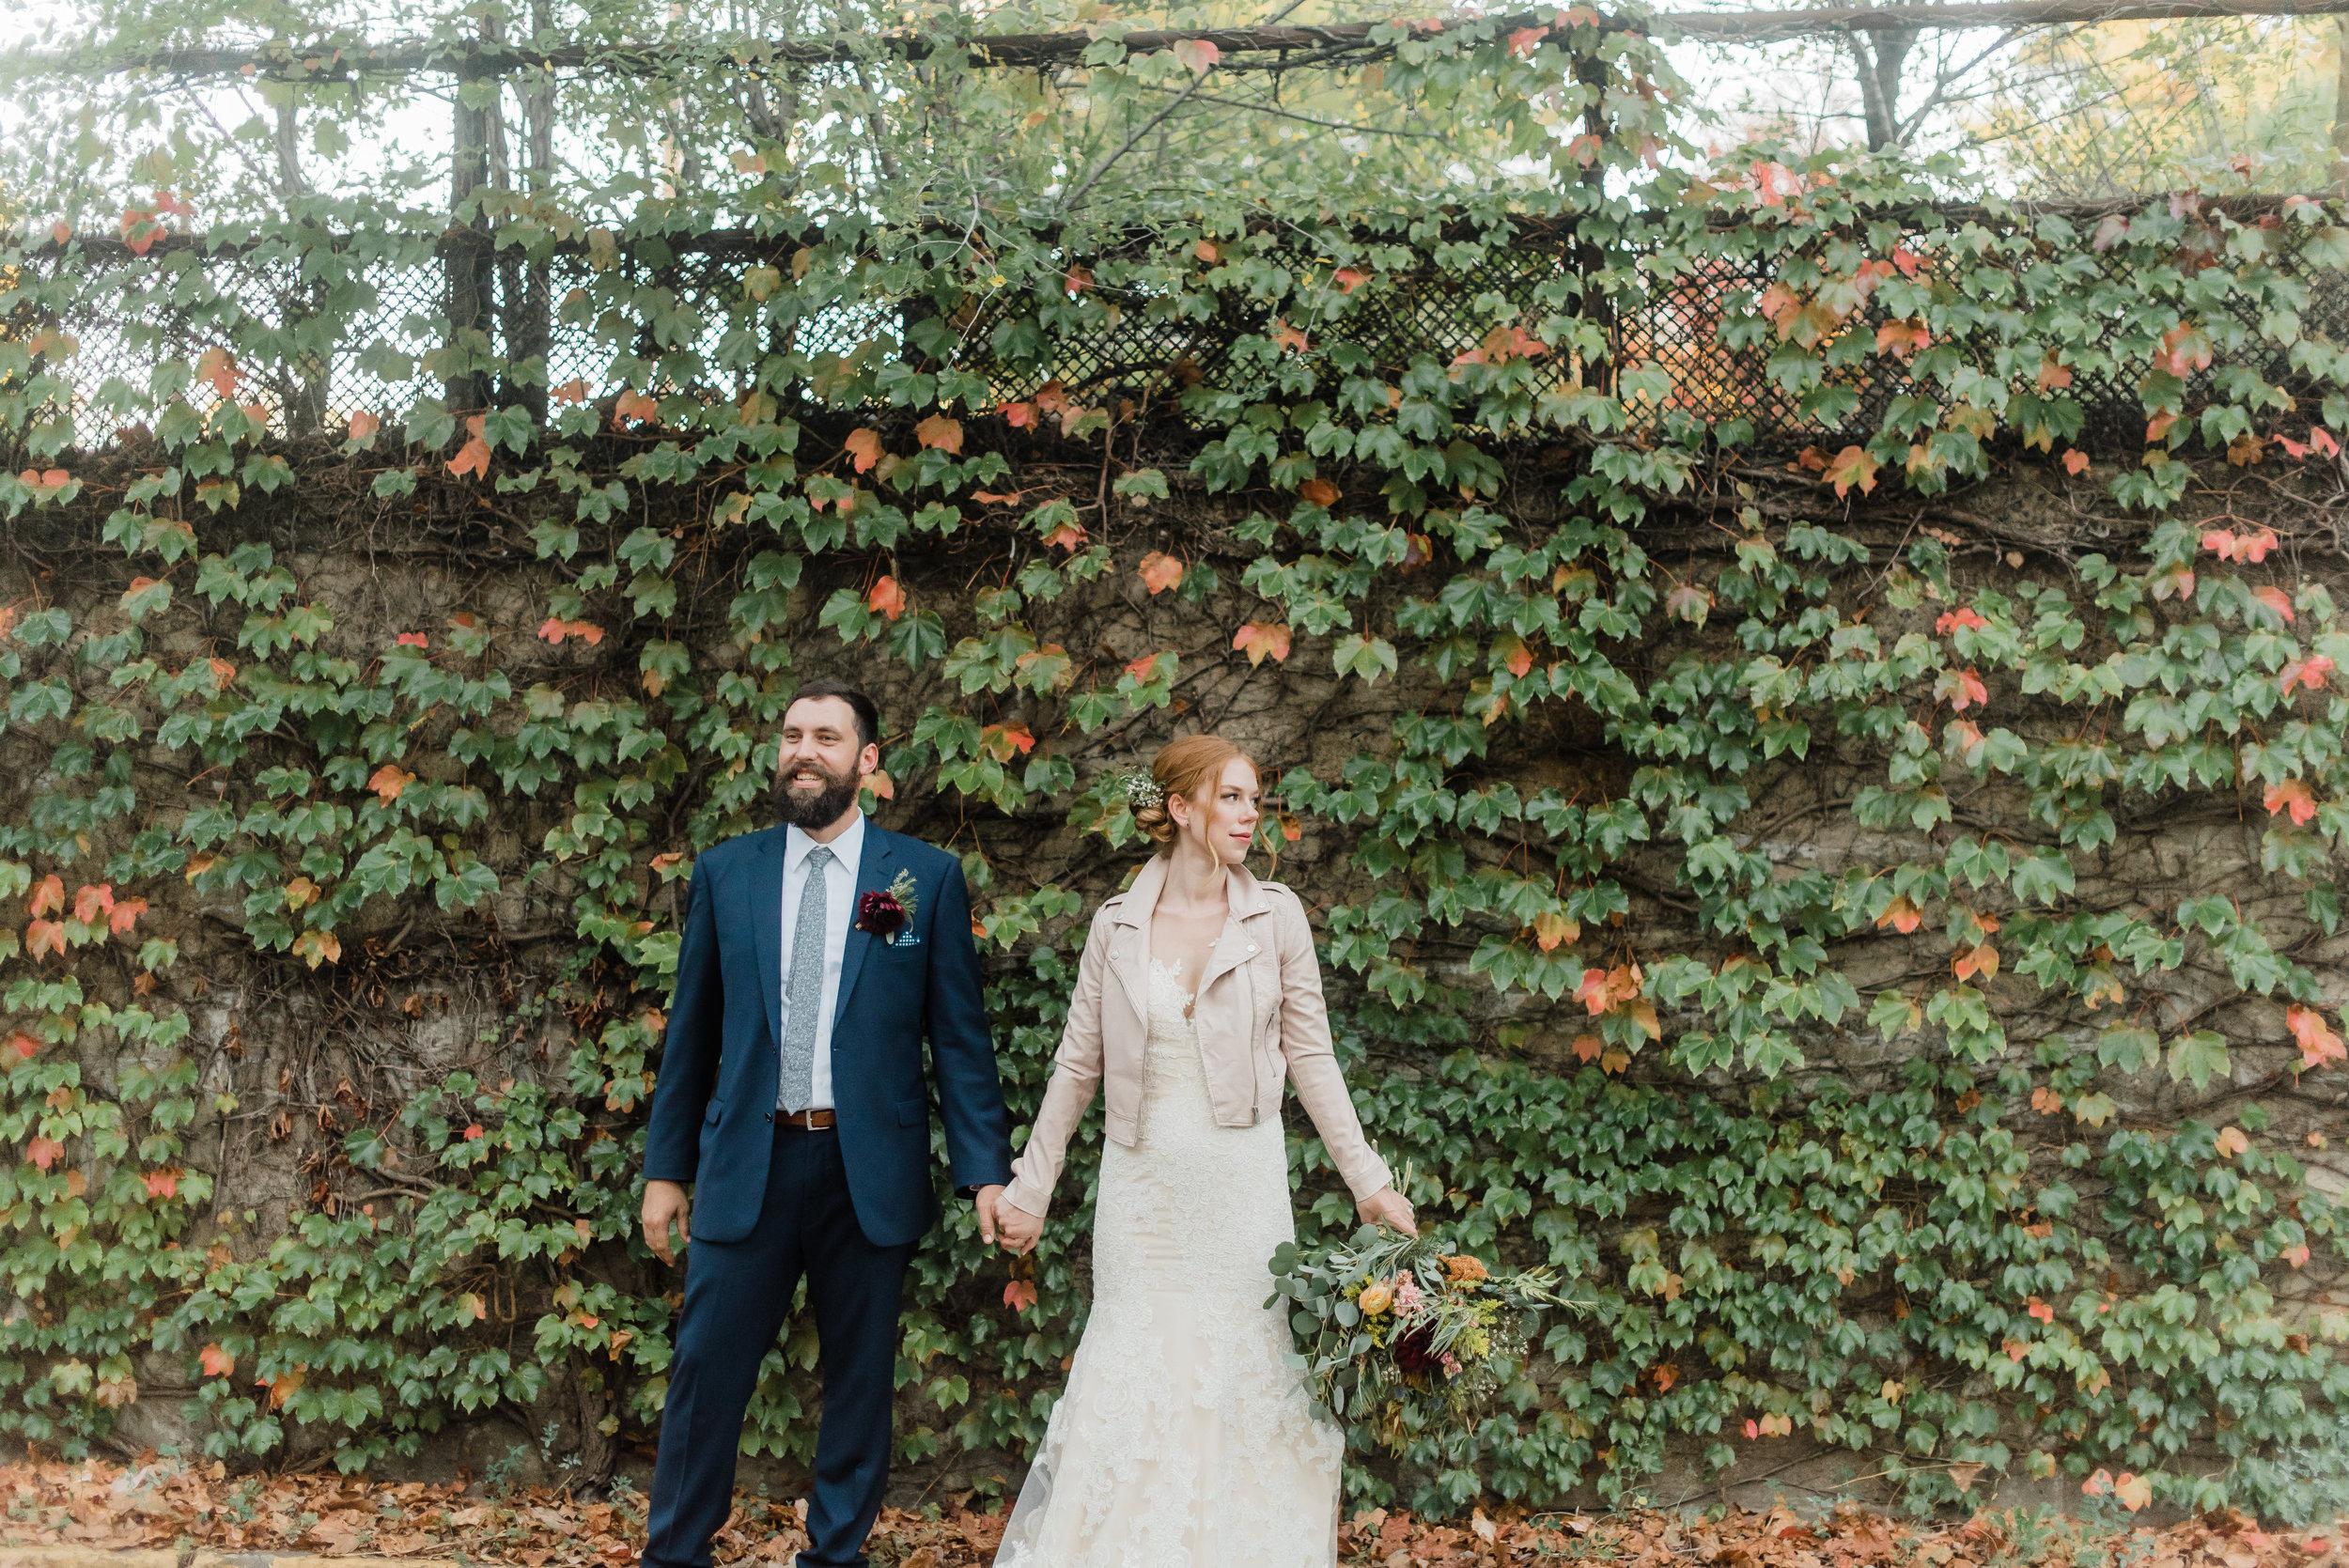 pittsburgh-wedding-photographer-modern-greenery-edgewoodclub-boho0134.jpg